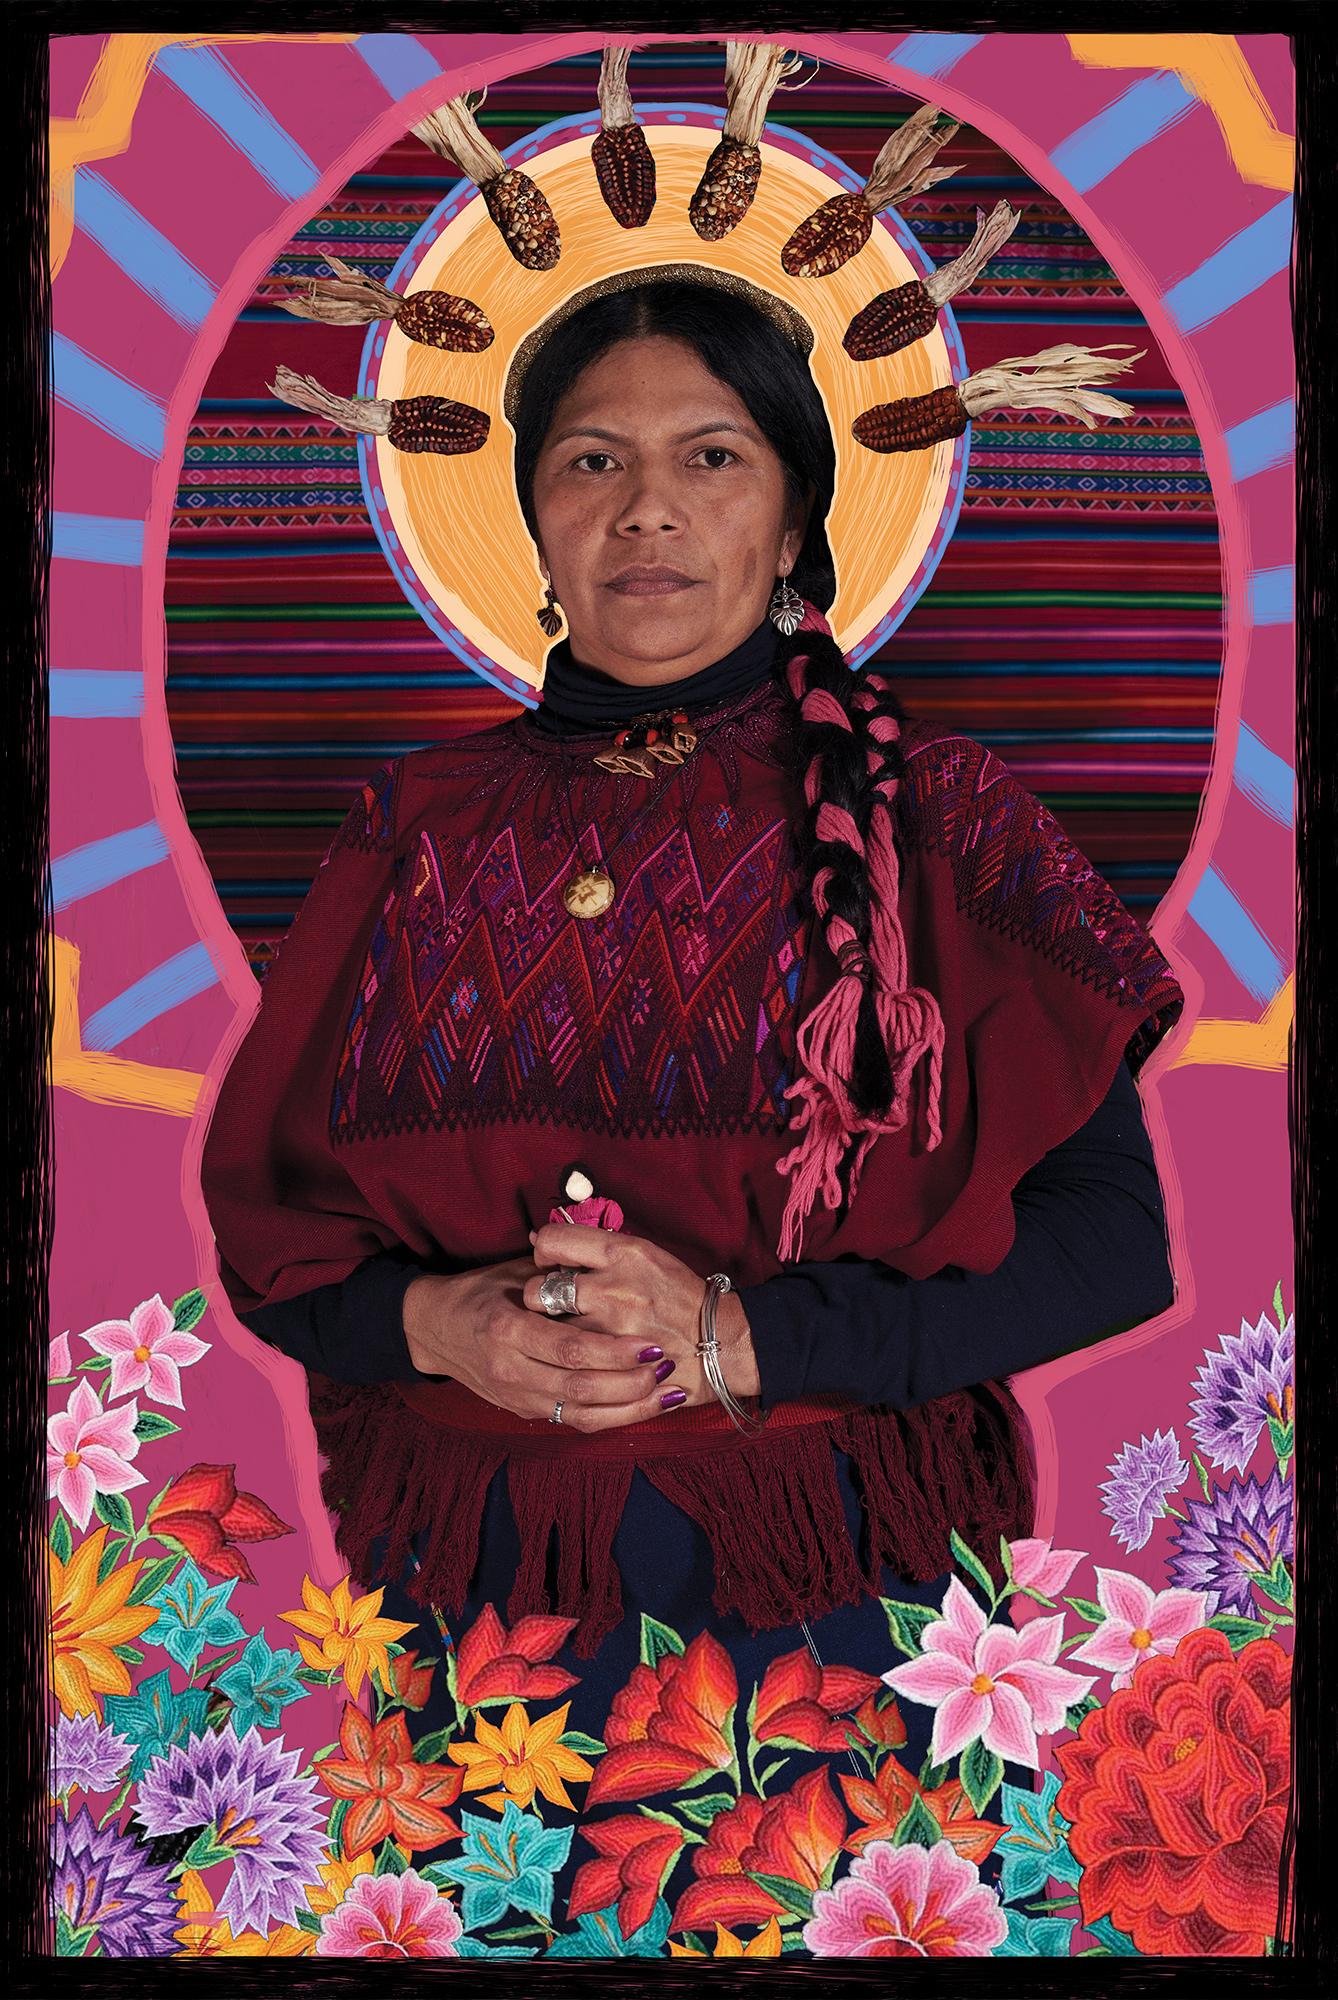 JahelGuerra_MujeresdelMaiz_01_2019.jpg